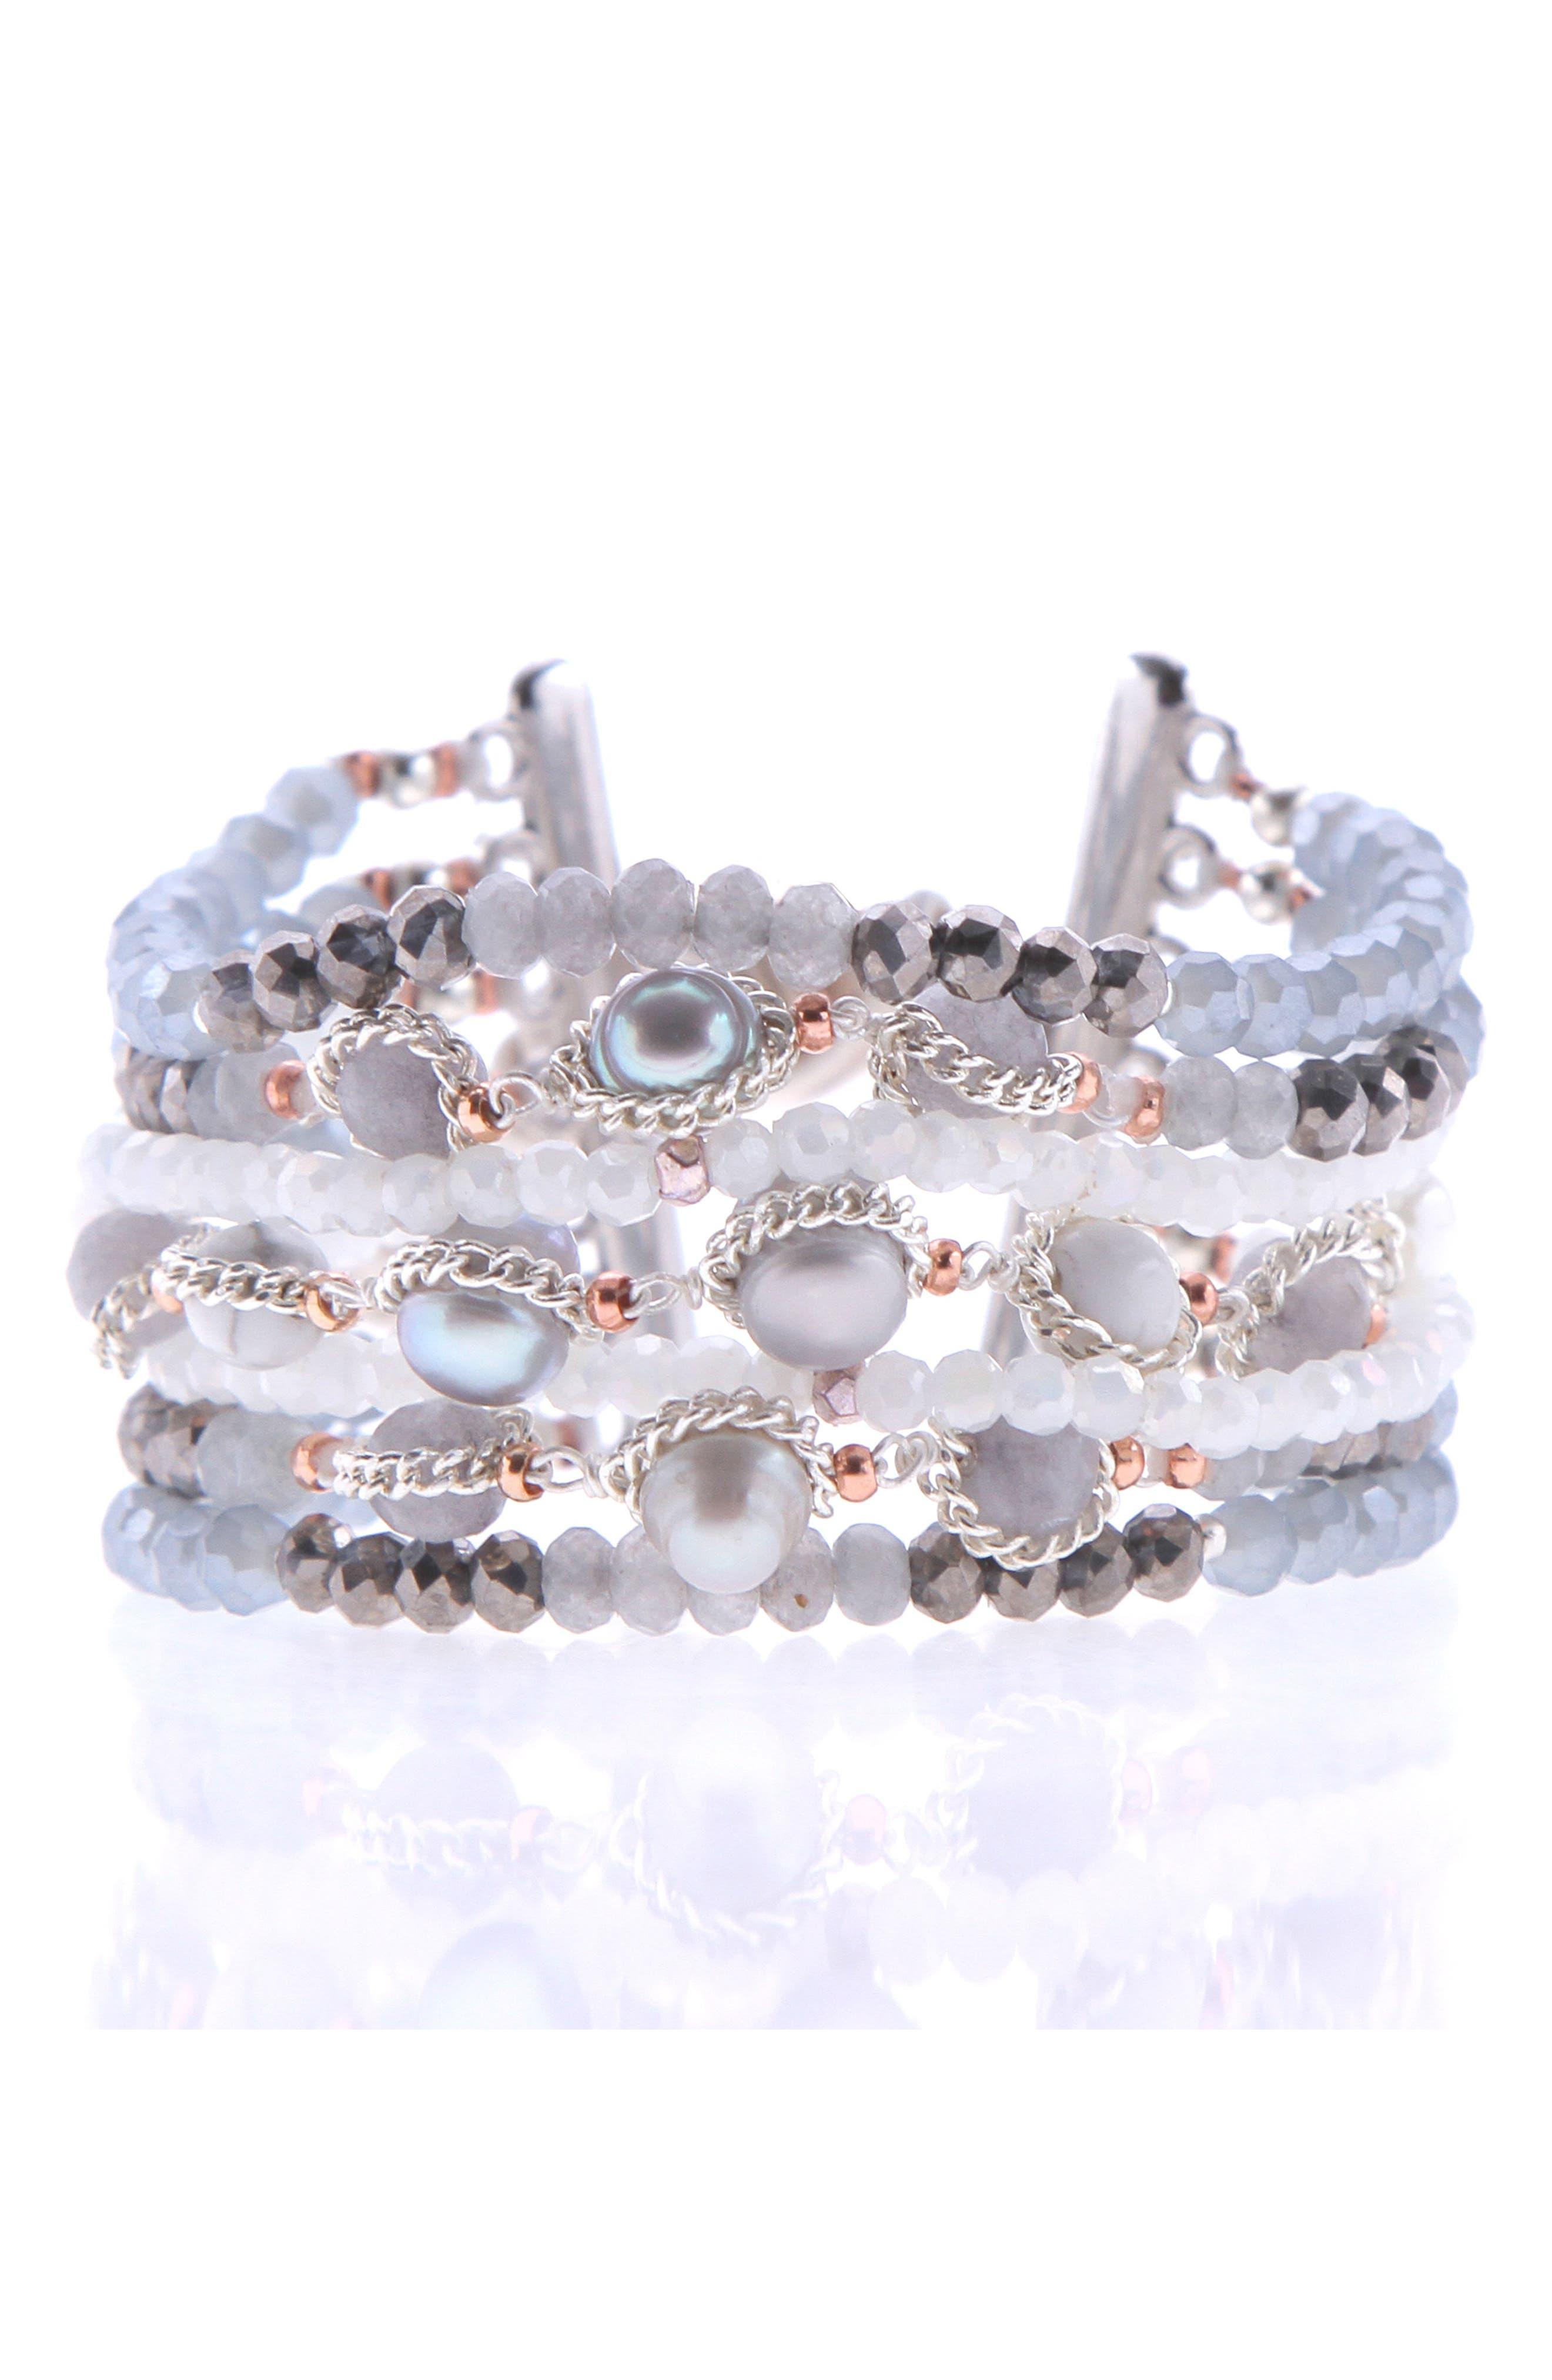 Crystal & Imitation Pearl Bracelet,                             Main thumbnail 1, color,                             040